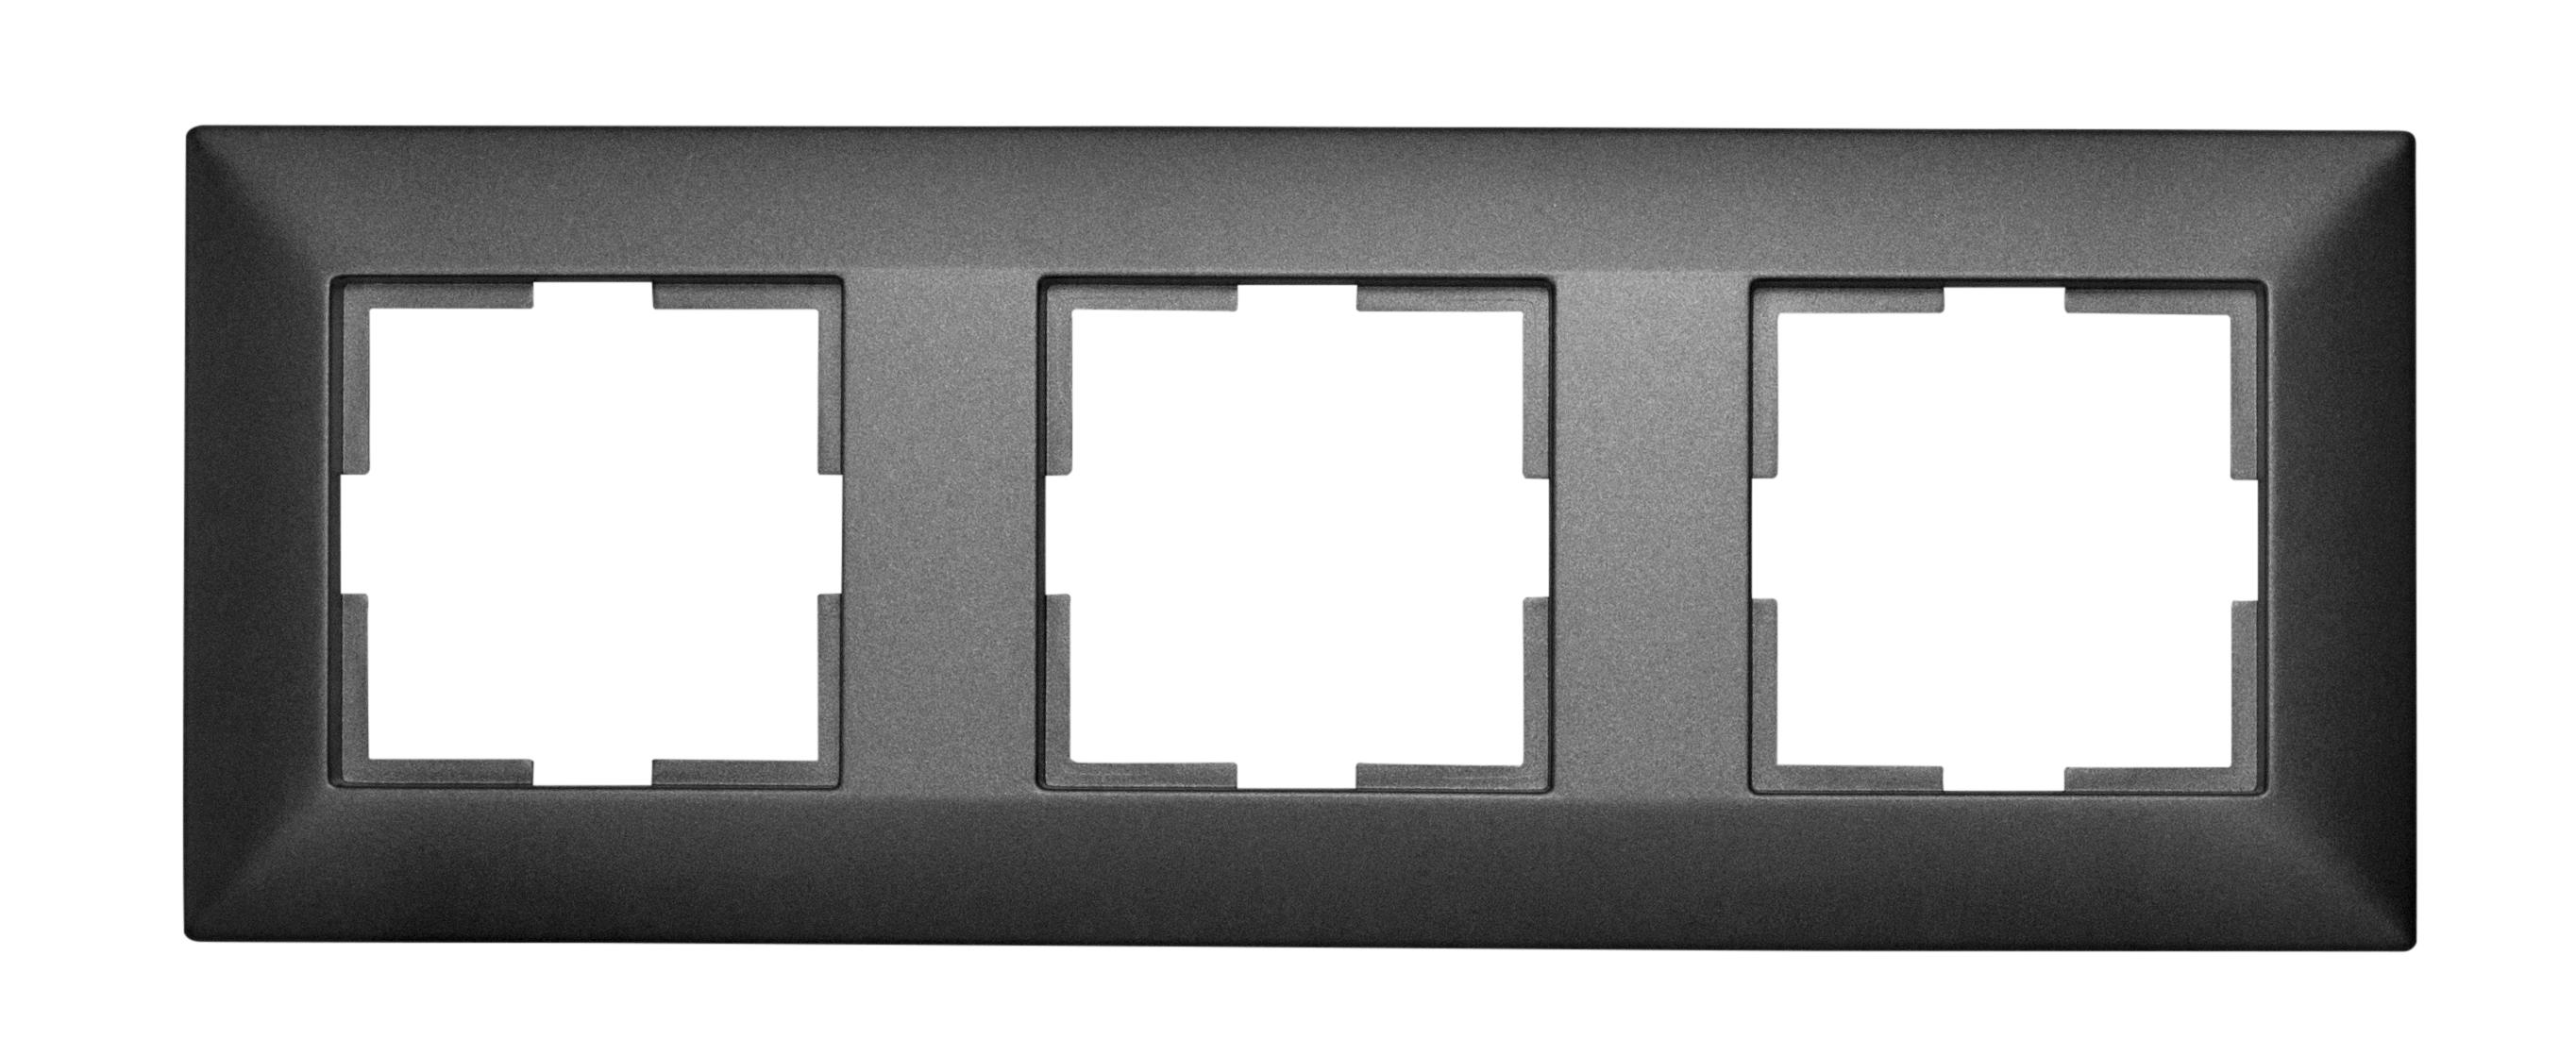 1 Stk Rahmen 3-fach, anthrazit EV115003--